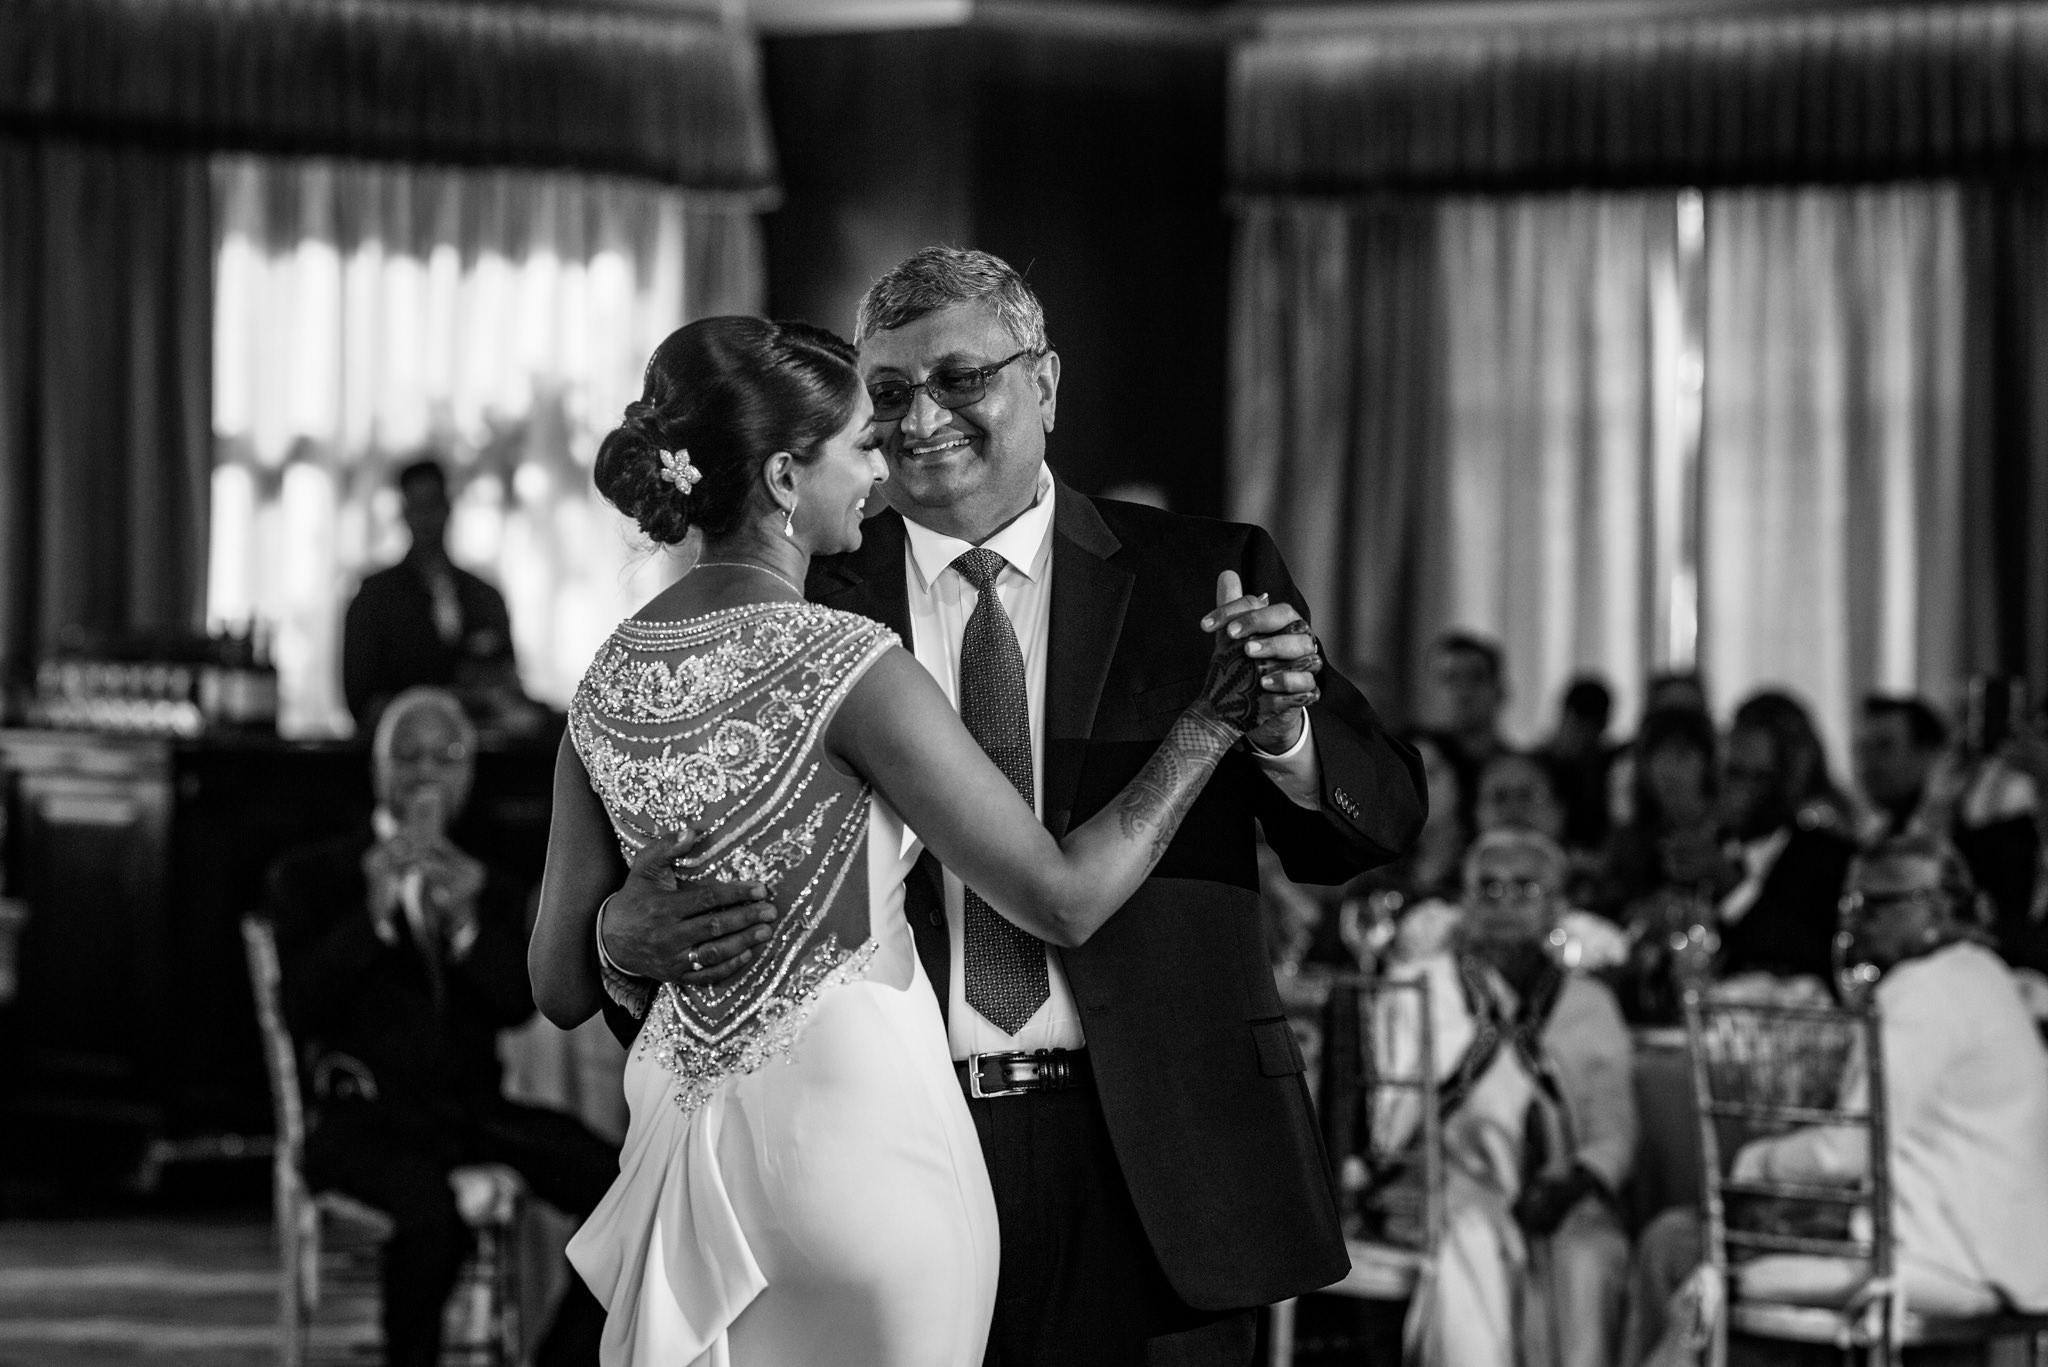 reception-wedding-photos-at-the-imperia.jpg